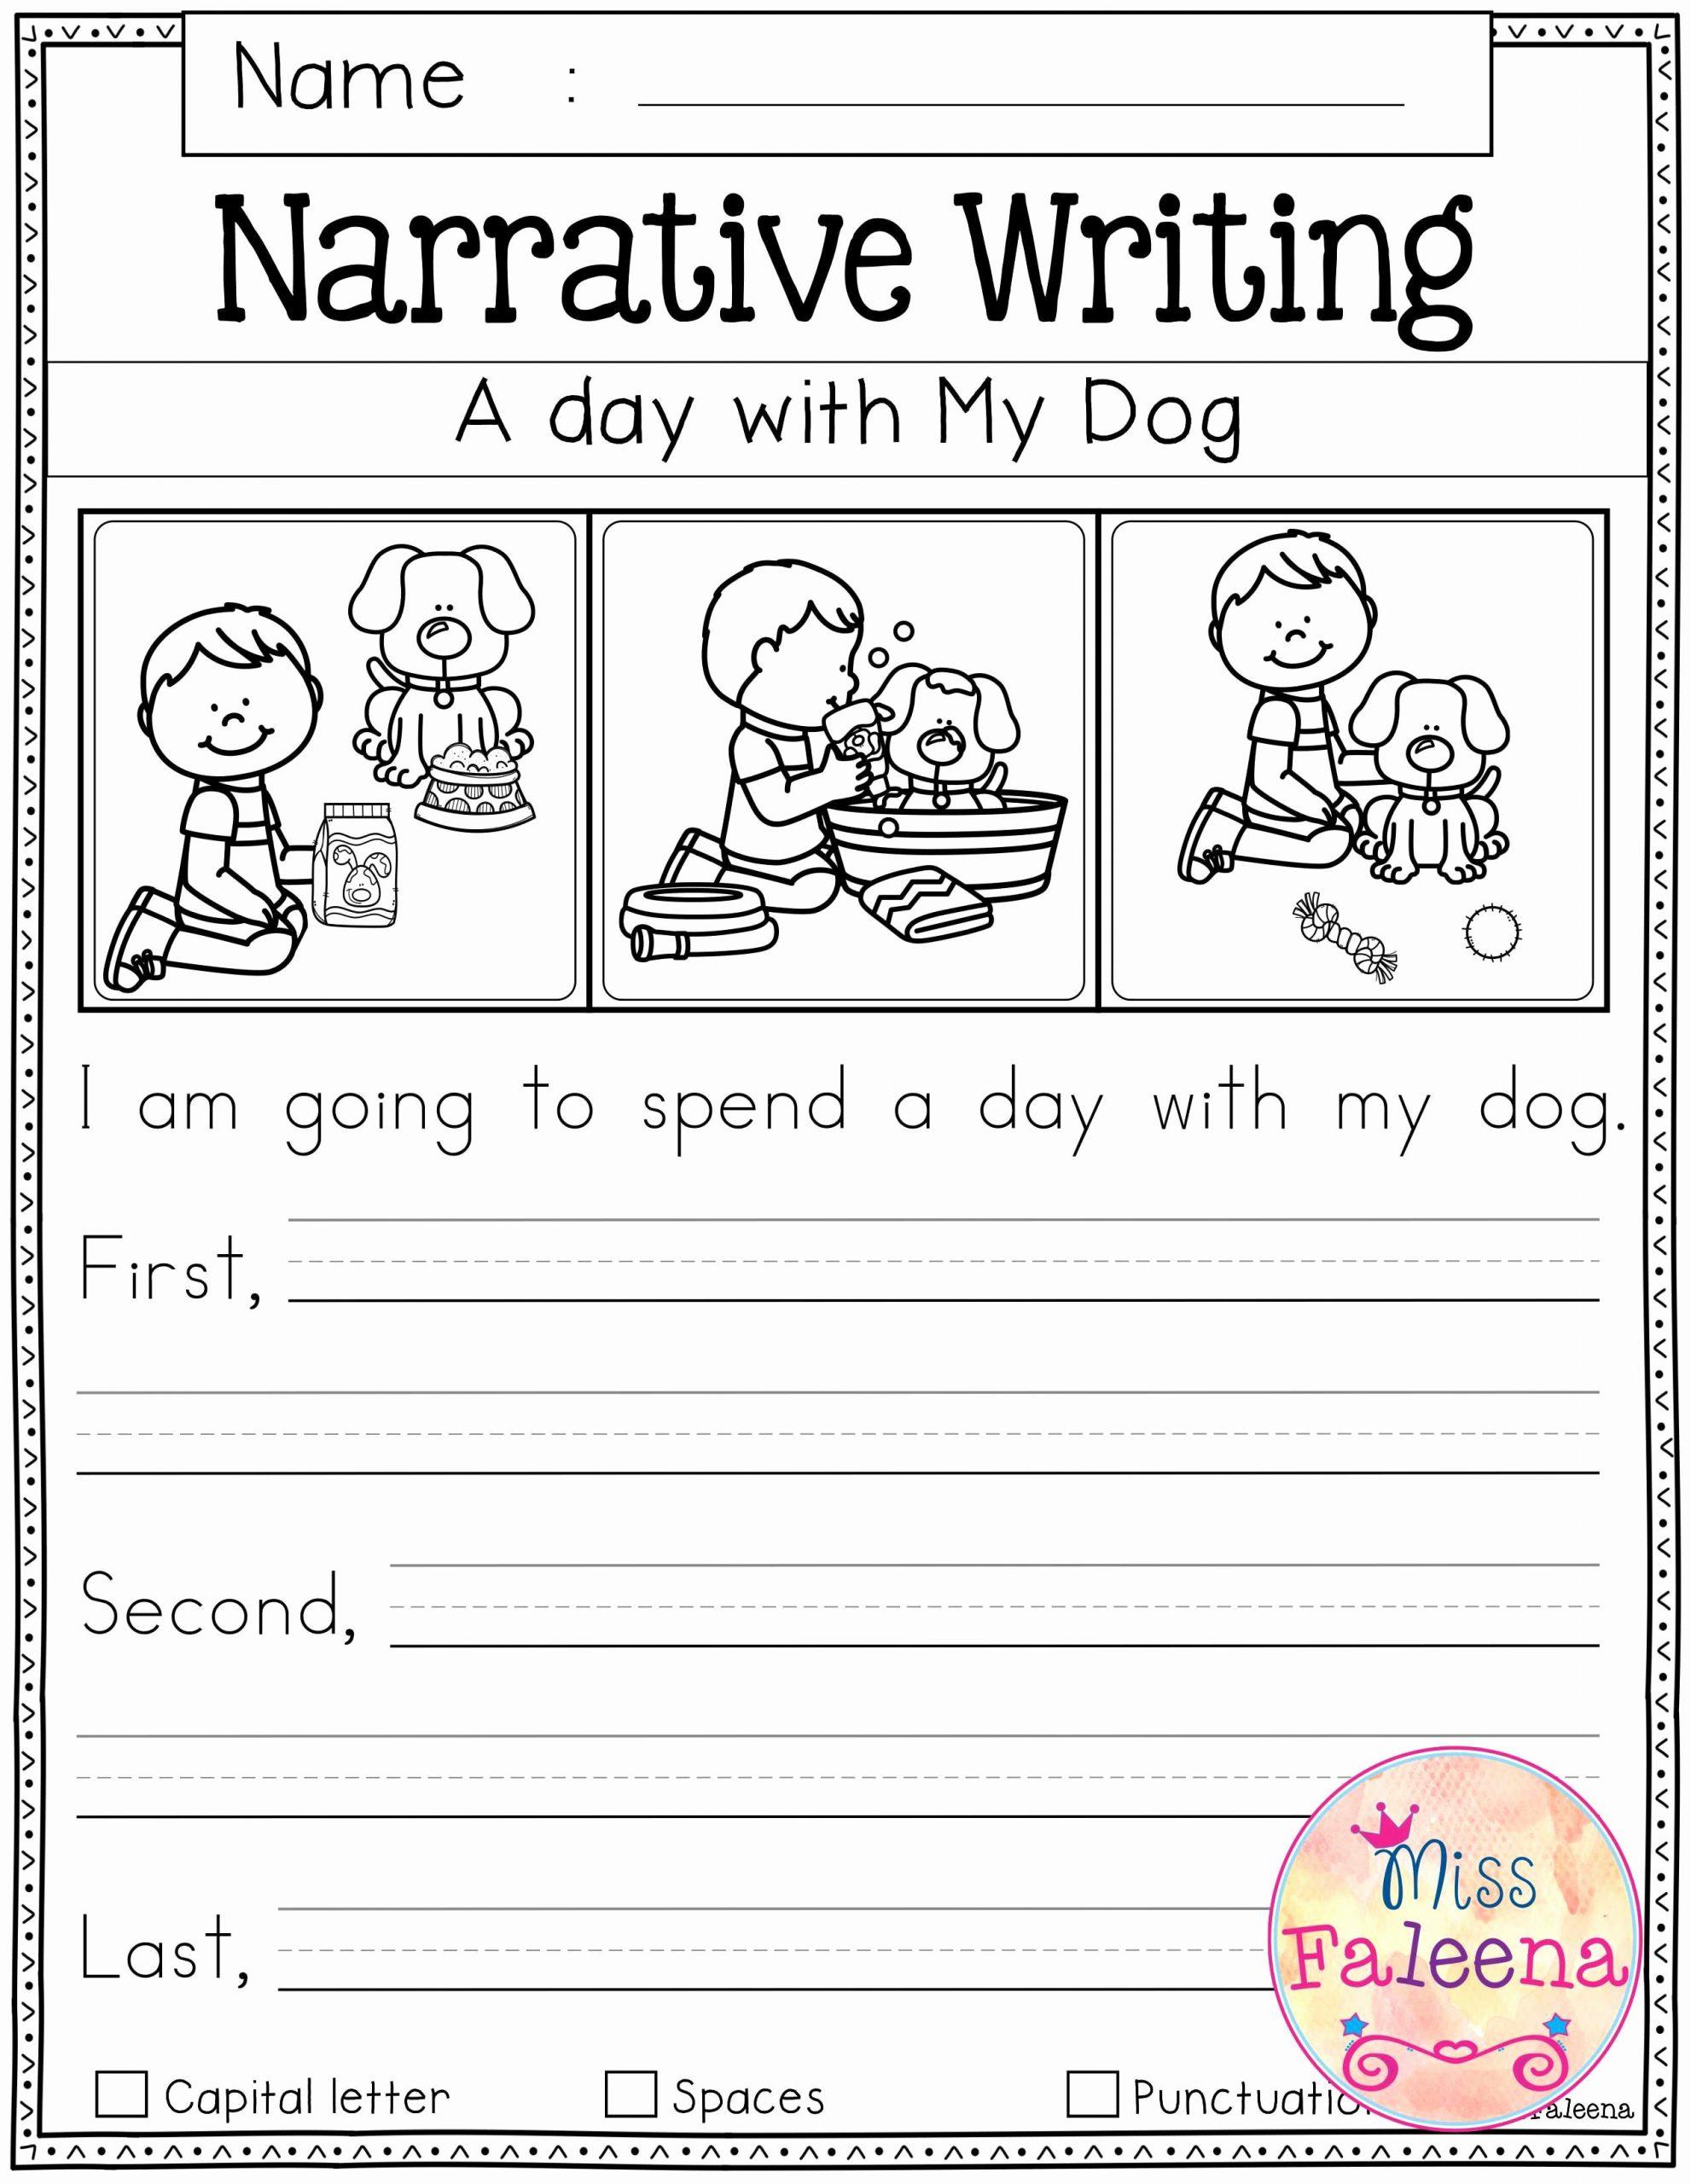 Writing Worksheet 1st Grade Luxury Writing Worksheets for 1st Grade Free Printable